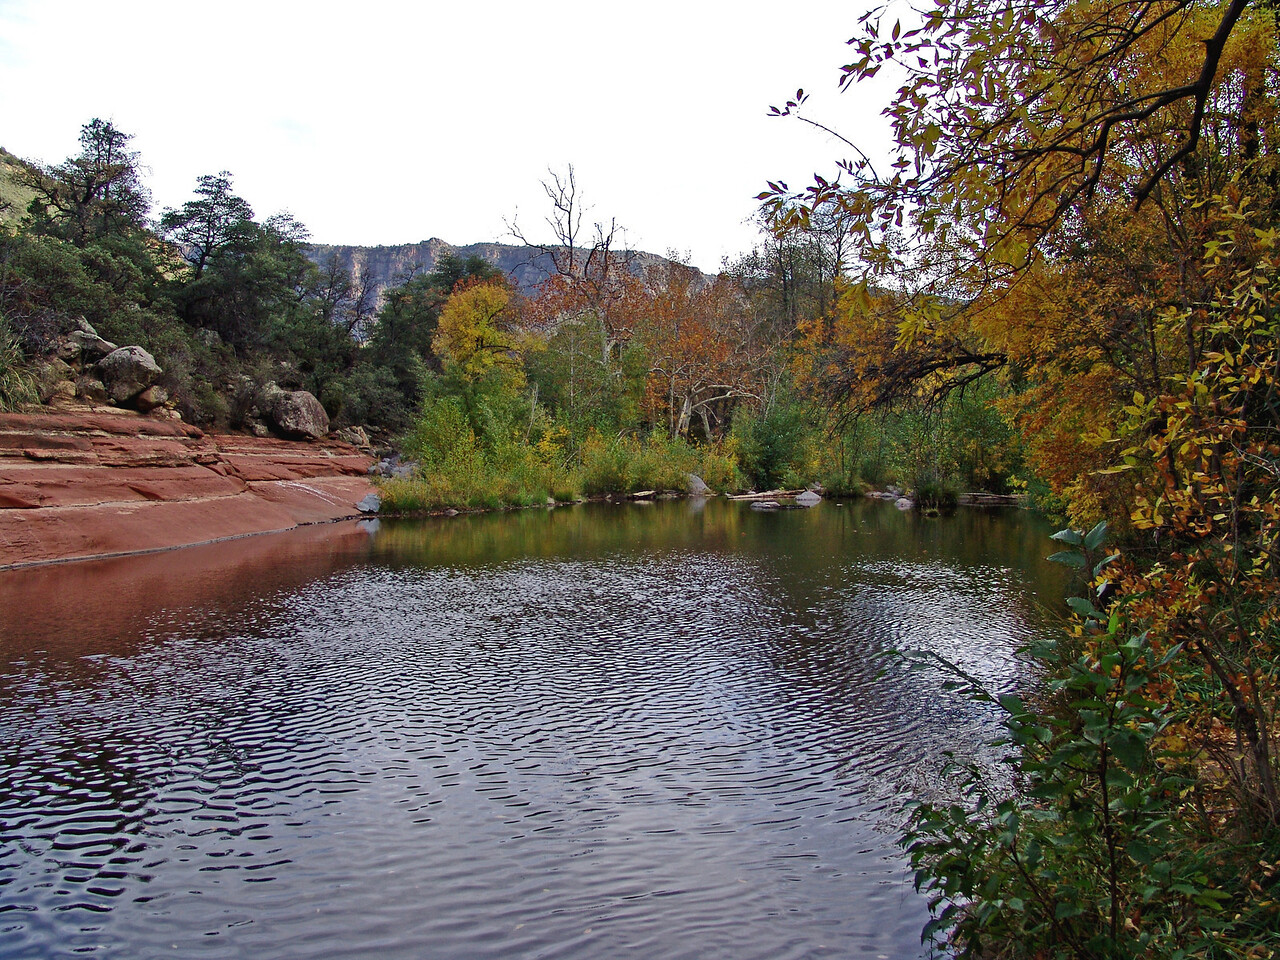 SECRET PLACE NEAR SEDONA, ARIZONA